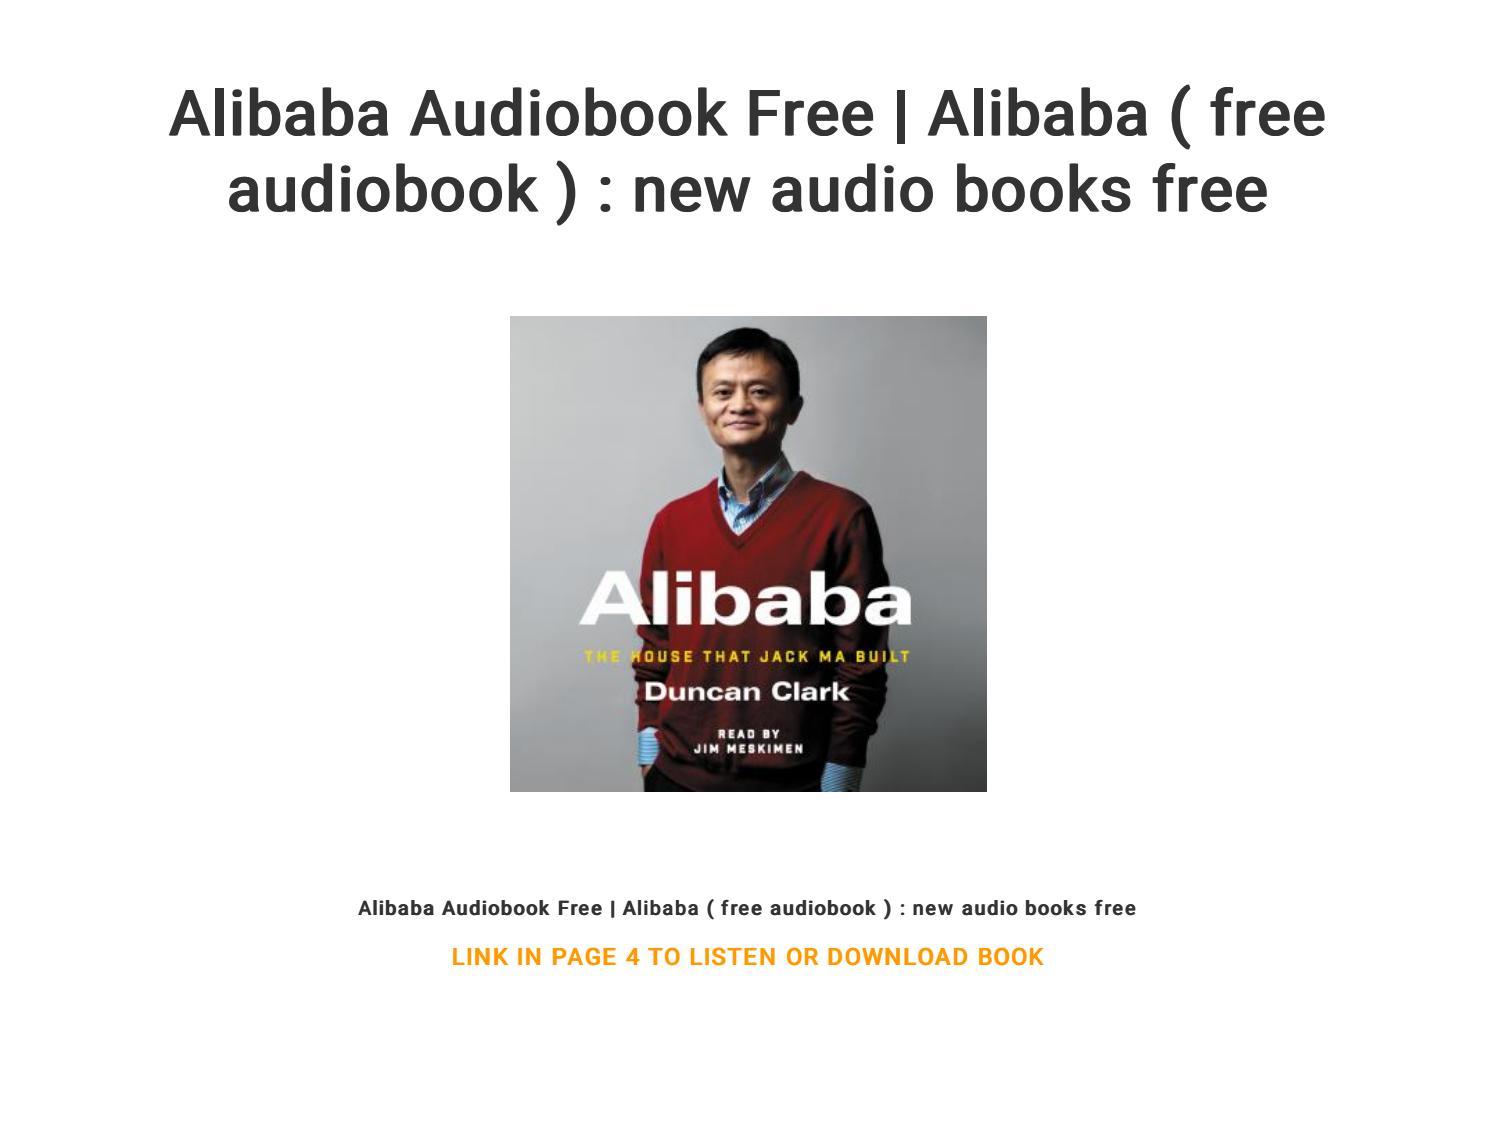 Alibaba Audiobook Free Alibaba Free Audiobook New Audio